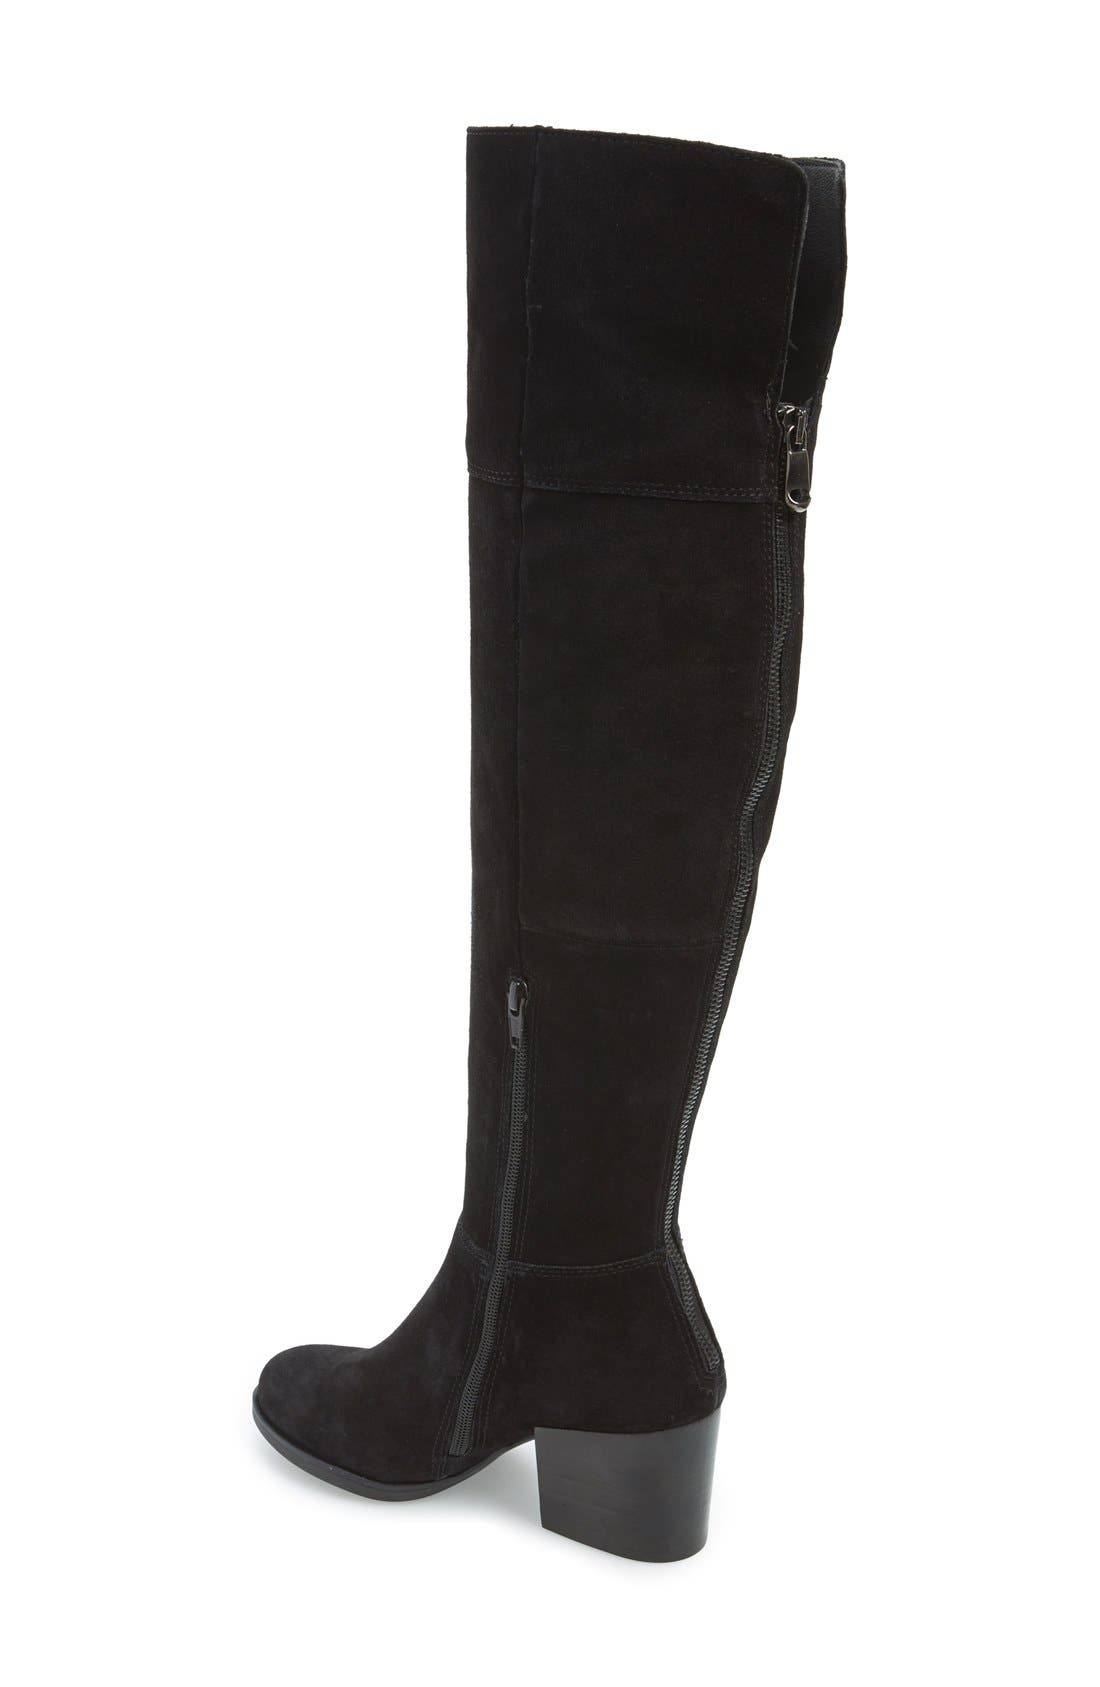 'Orabela' Knee High Boot,                             Alternate thumbnail 4, color,                             006